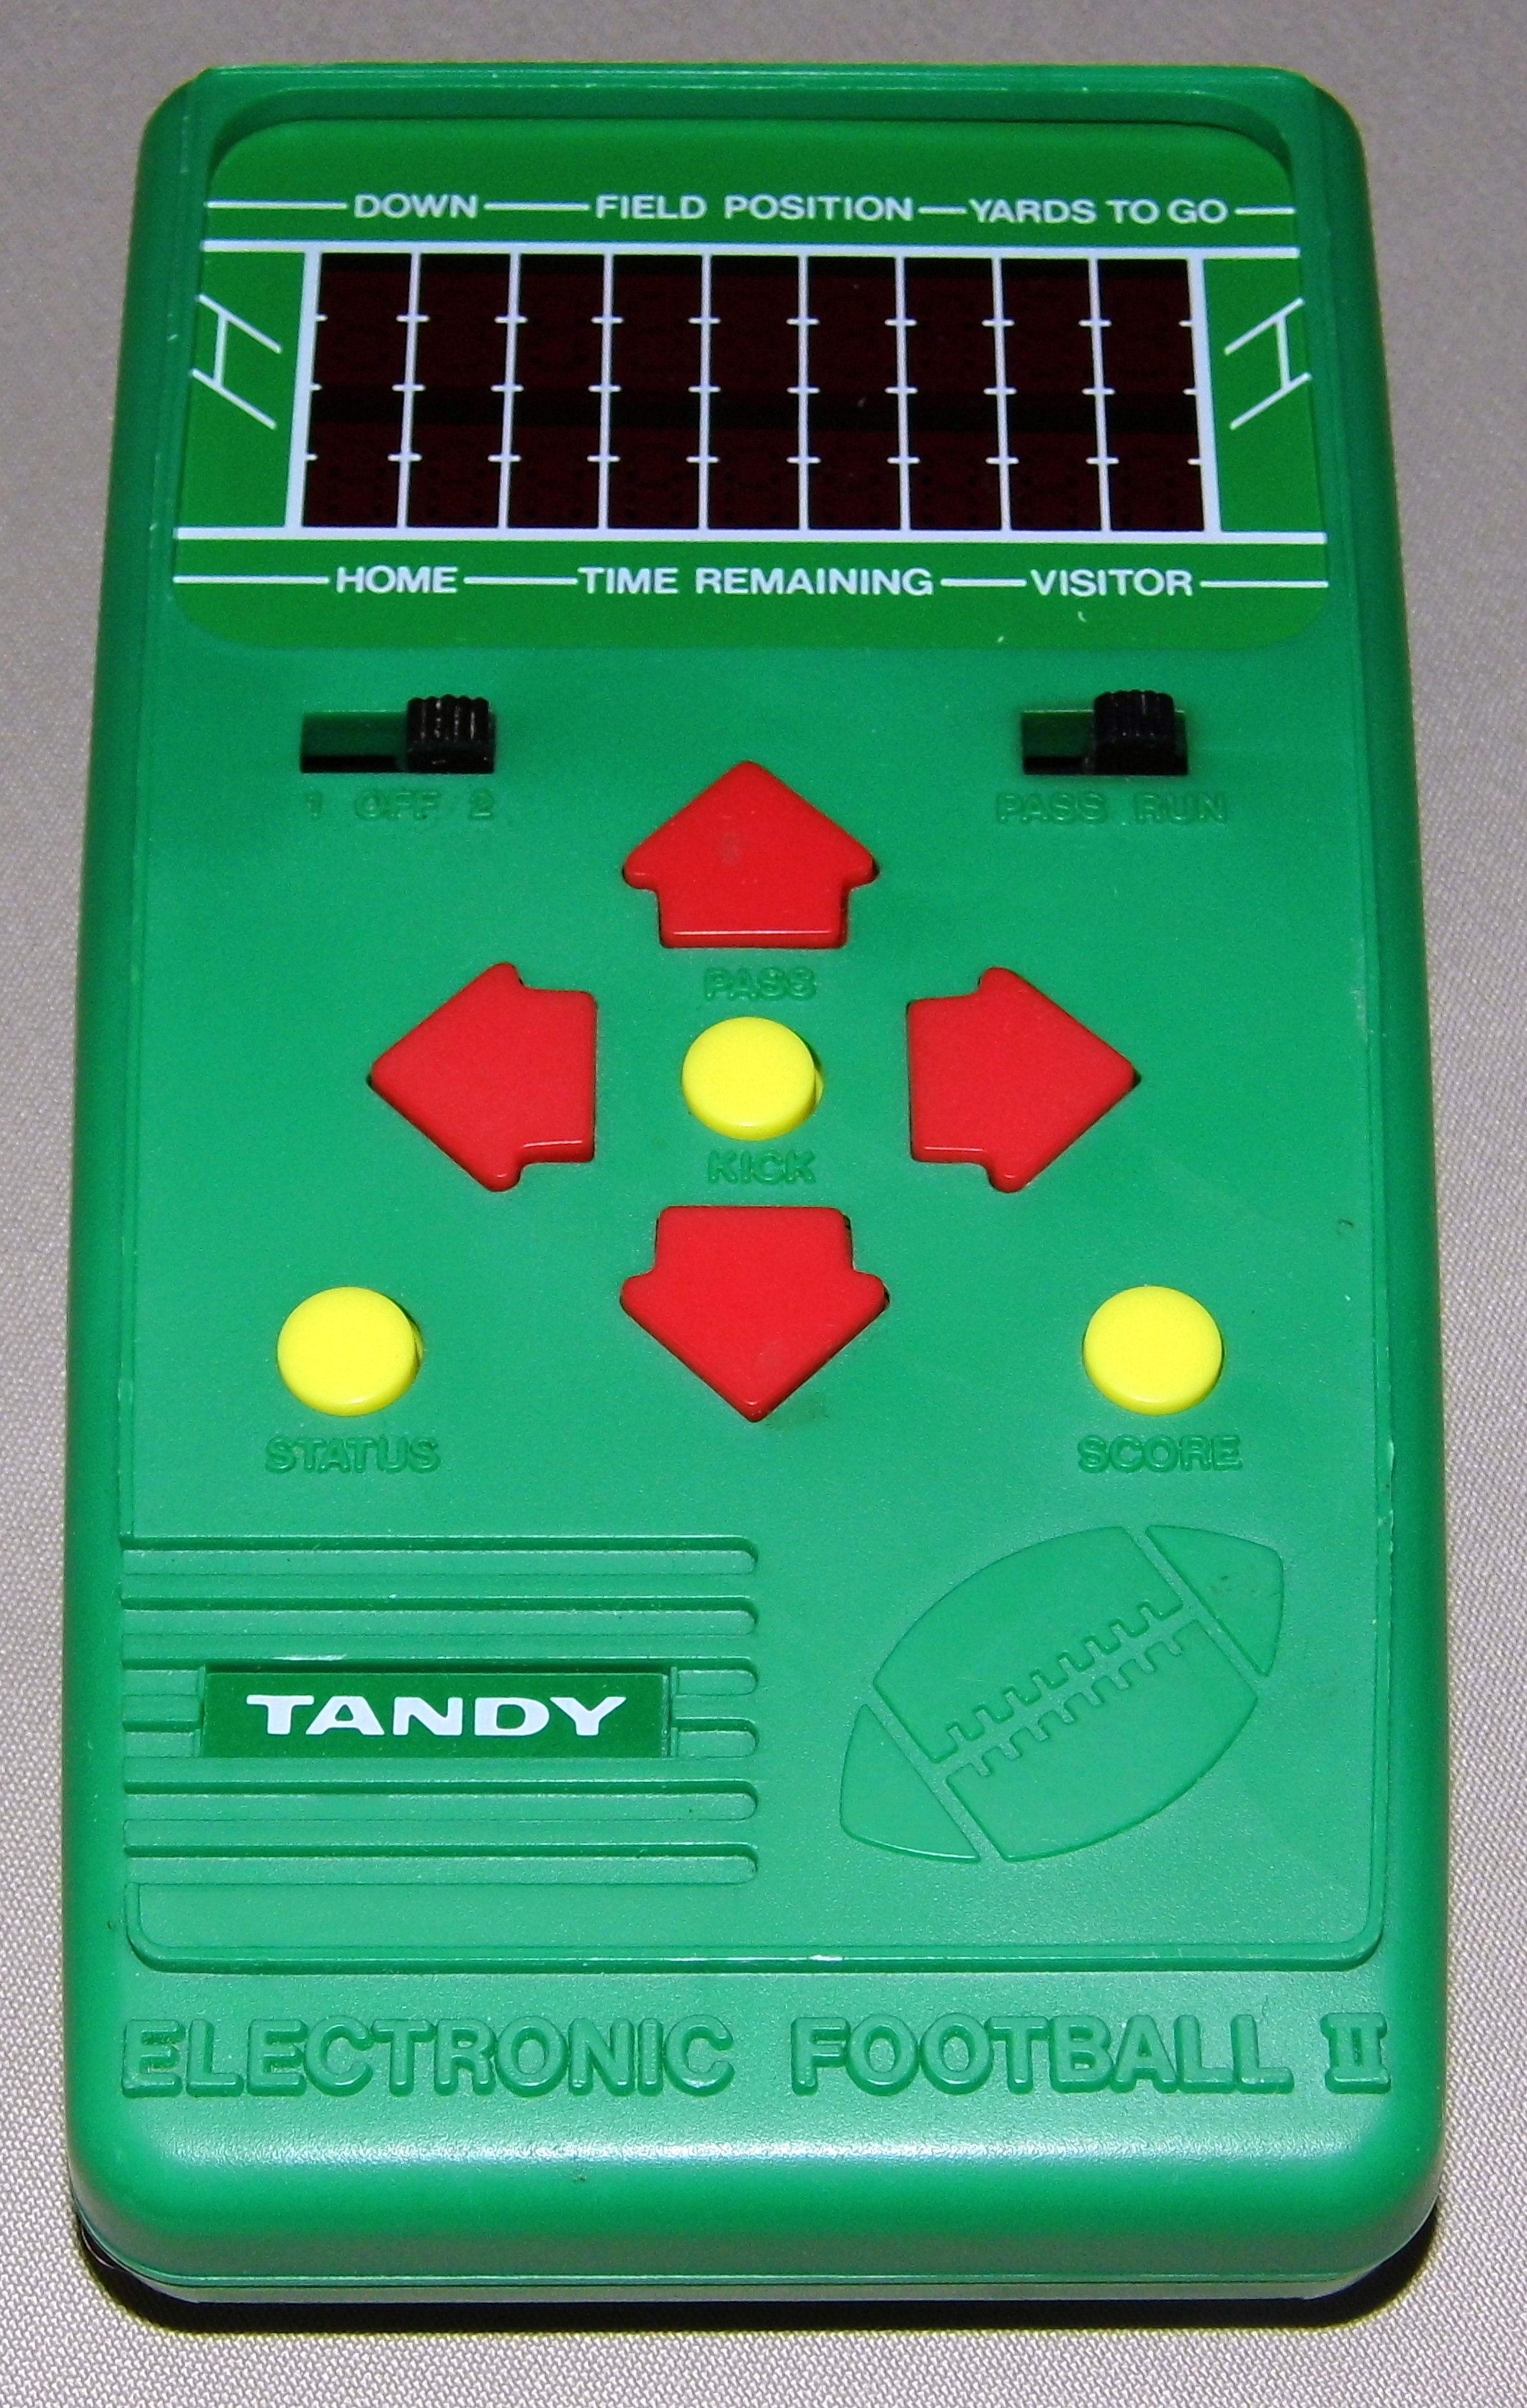 File:Tandy Electronic Football II, Made in Hong Kong, Sold Through Radio Shack, Catalog No. 60